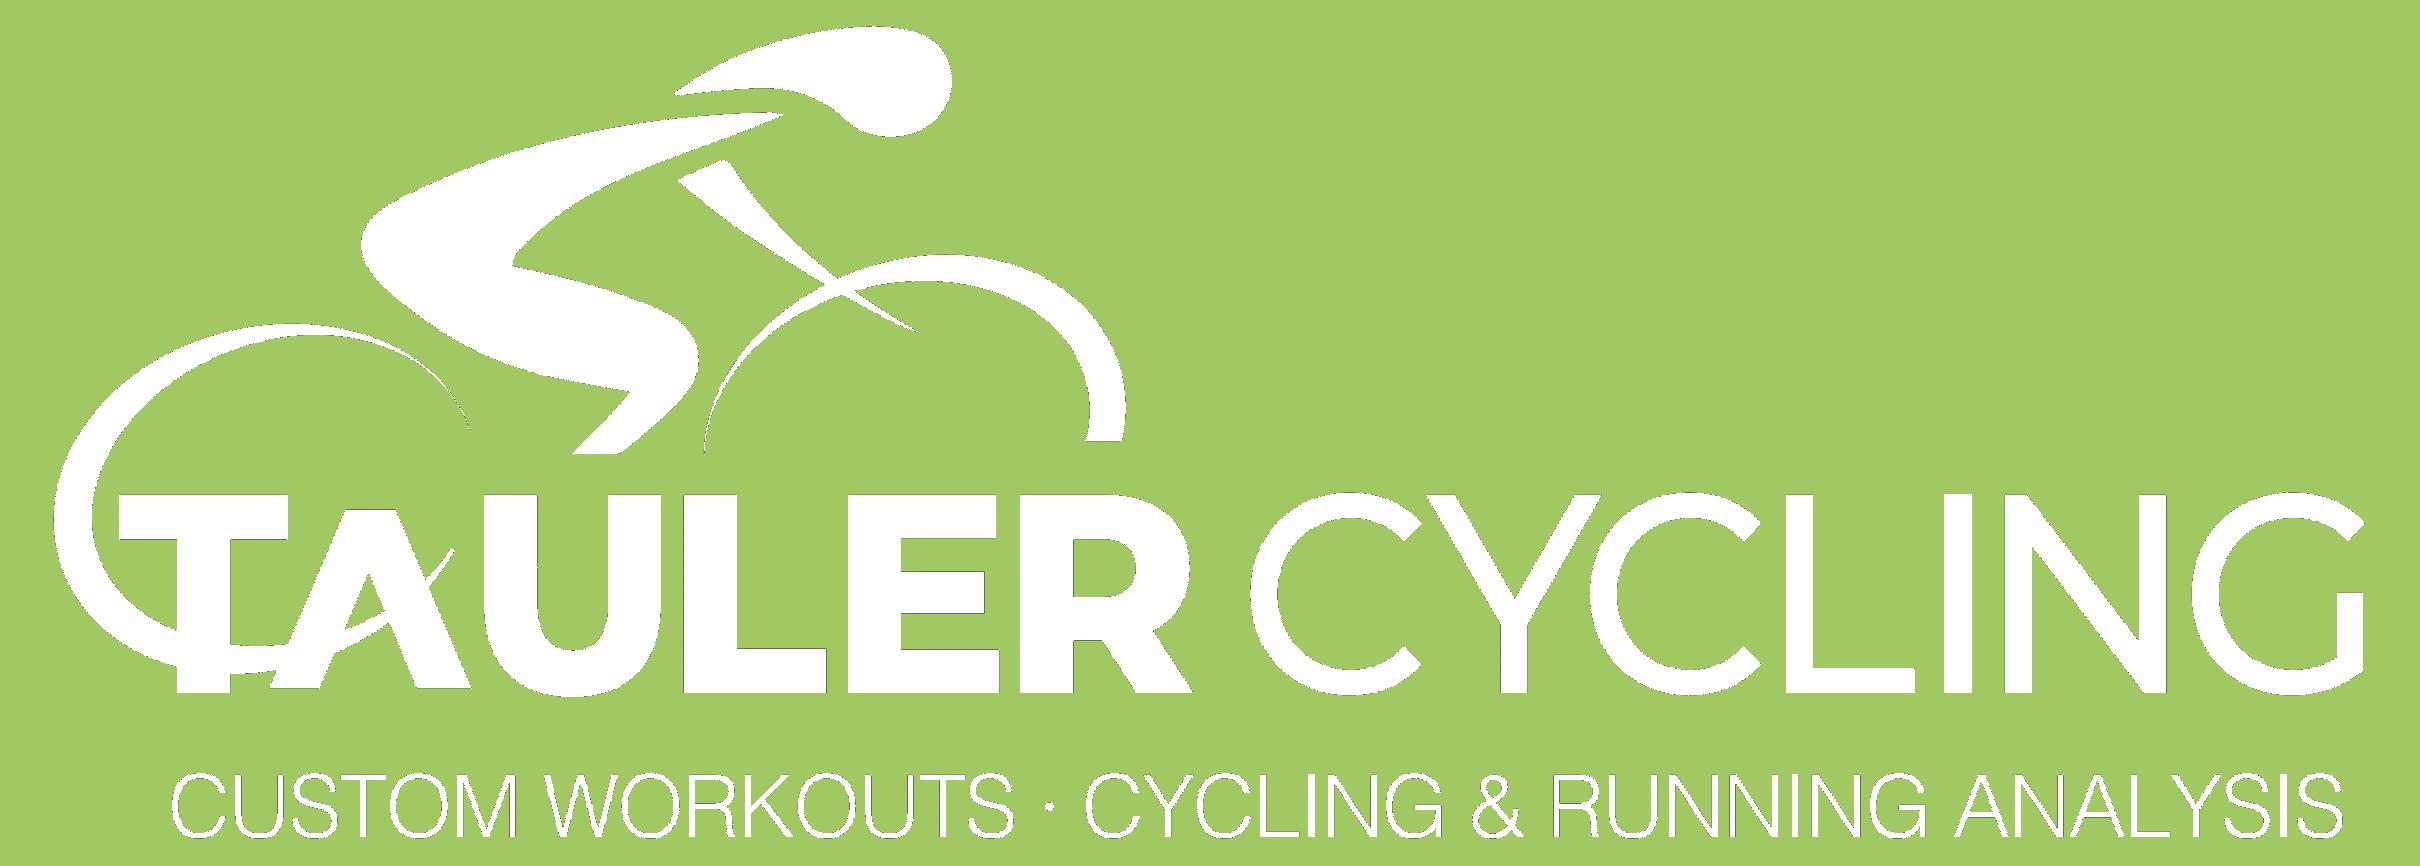 taulercycling.com